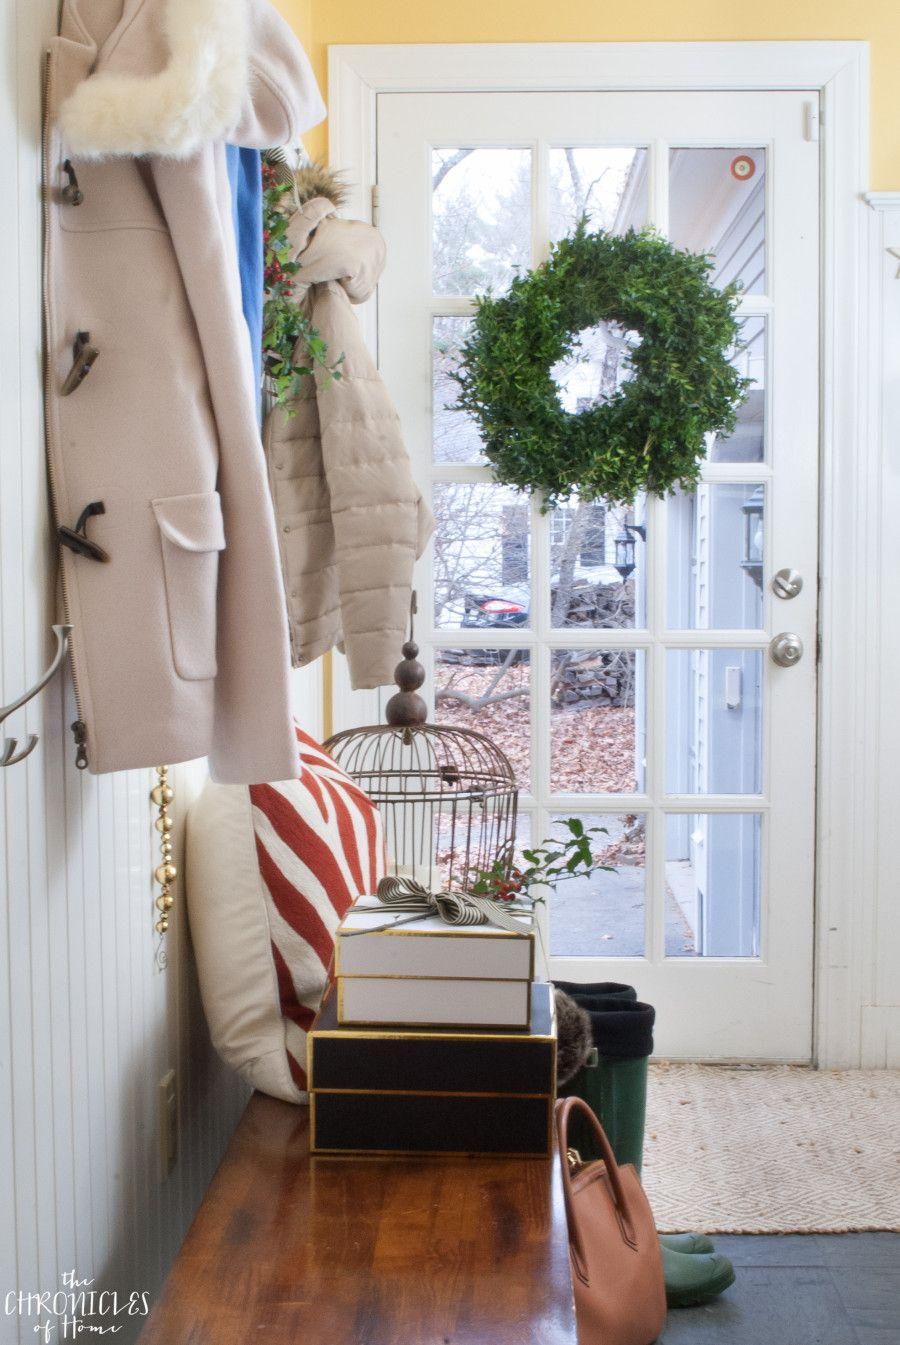 Part 2 The Chronicles of Home Christmas 2 Christmas